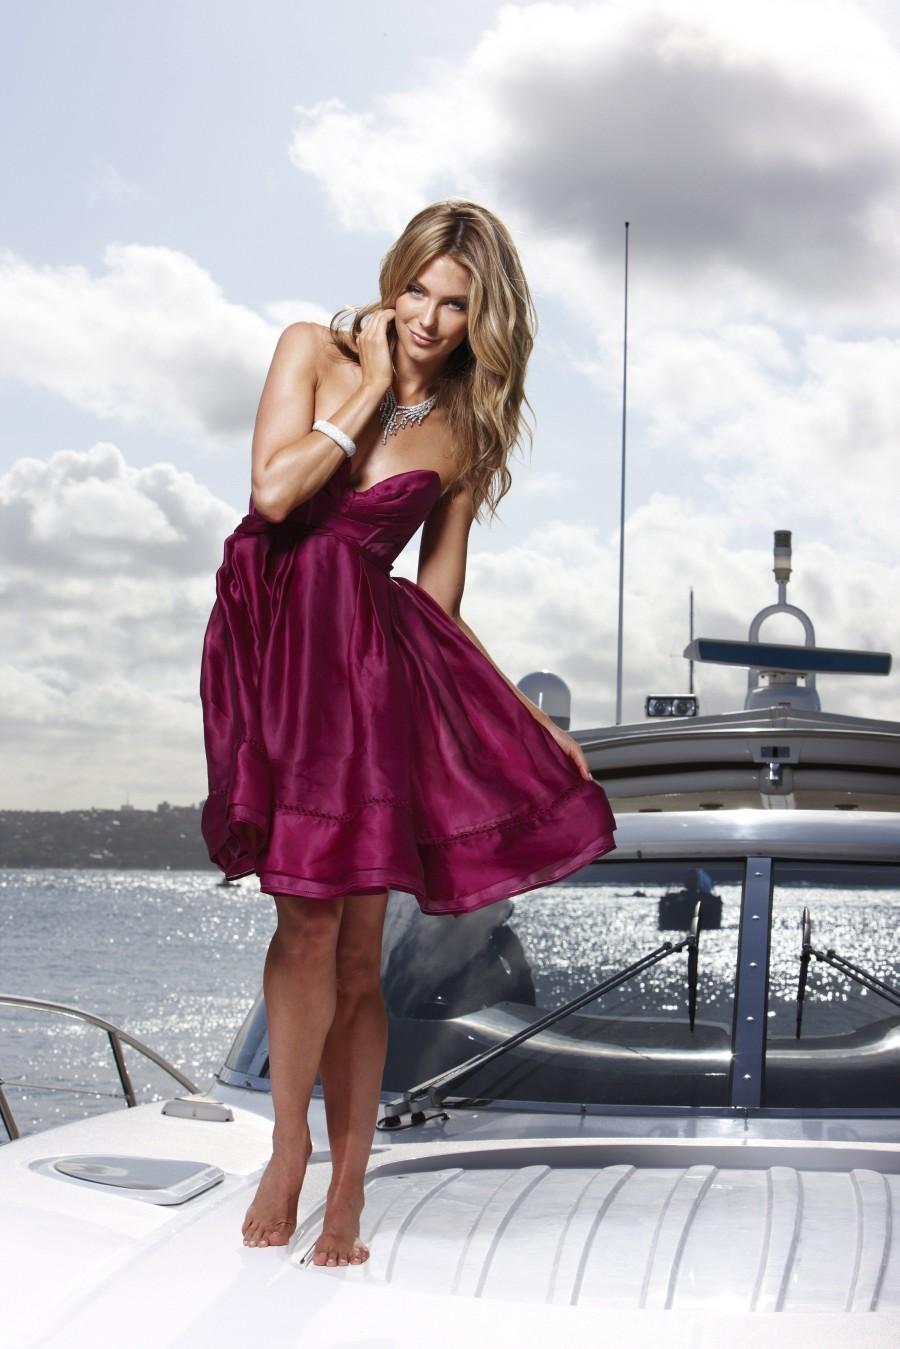 http://2.bp.blogspot.com/-gOk89c3GkXI/Tz-qdc2E31I/AAAAAAAALFI/Y6Ph4mE6FAI/s1600/Jennifer+Hawkins+-+Sydney+Harbour+Photoshoot_08.jpg